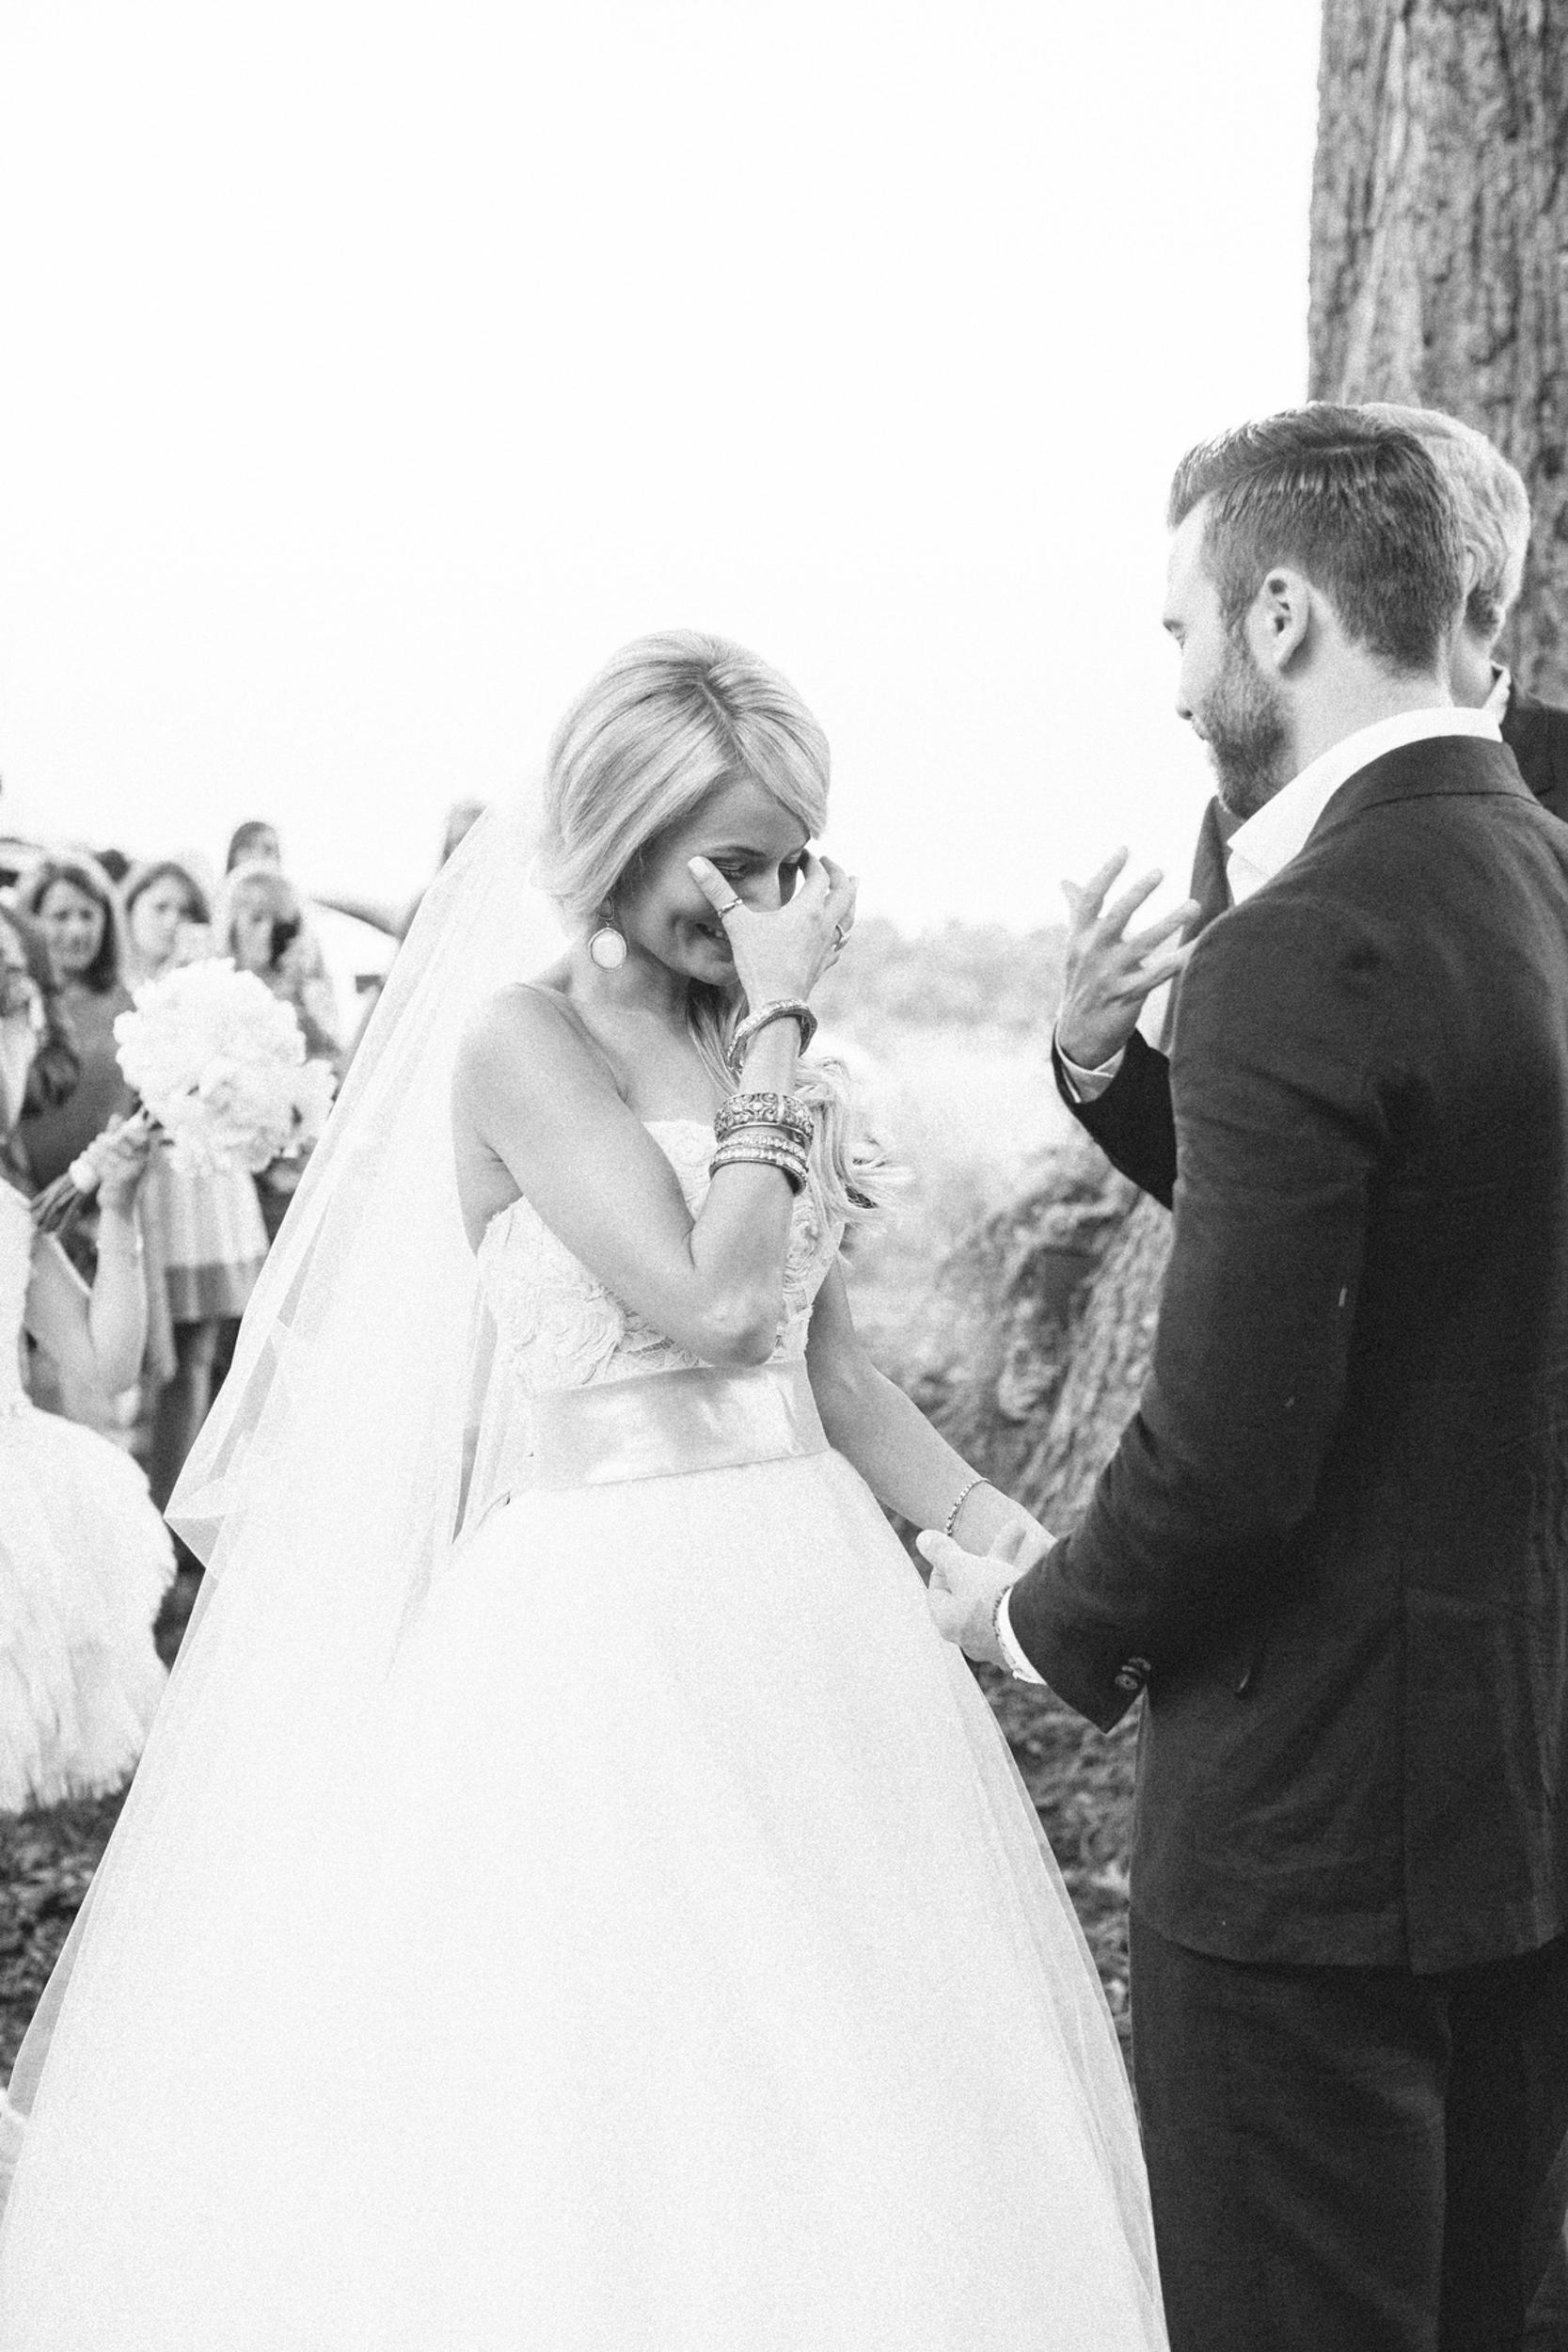 south_carolina_farm_wedding_rustic_chic_surprise_secret_luxe_wedding_bachelorette_emily_maynard_real_weddings-23.jpg